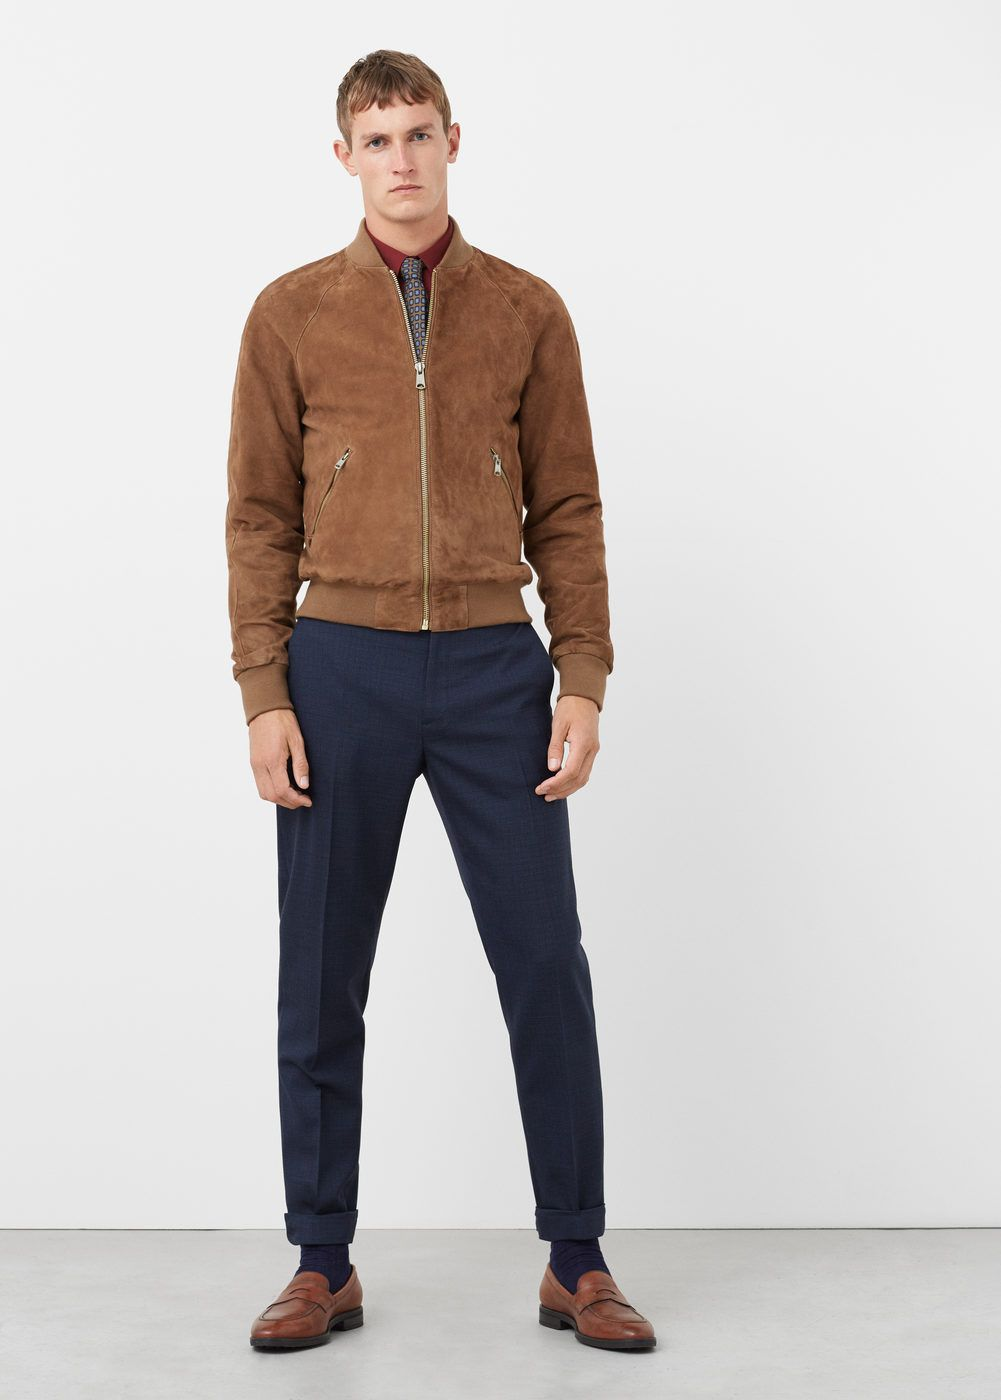 Suede bomber jacket - Men   The Preppy Style - Part I   Bomber ... d519378e96cd